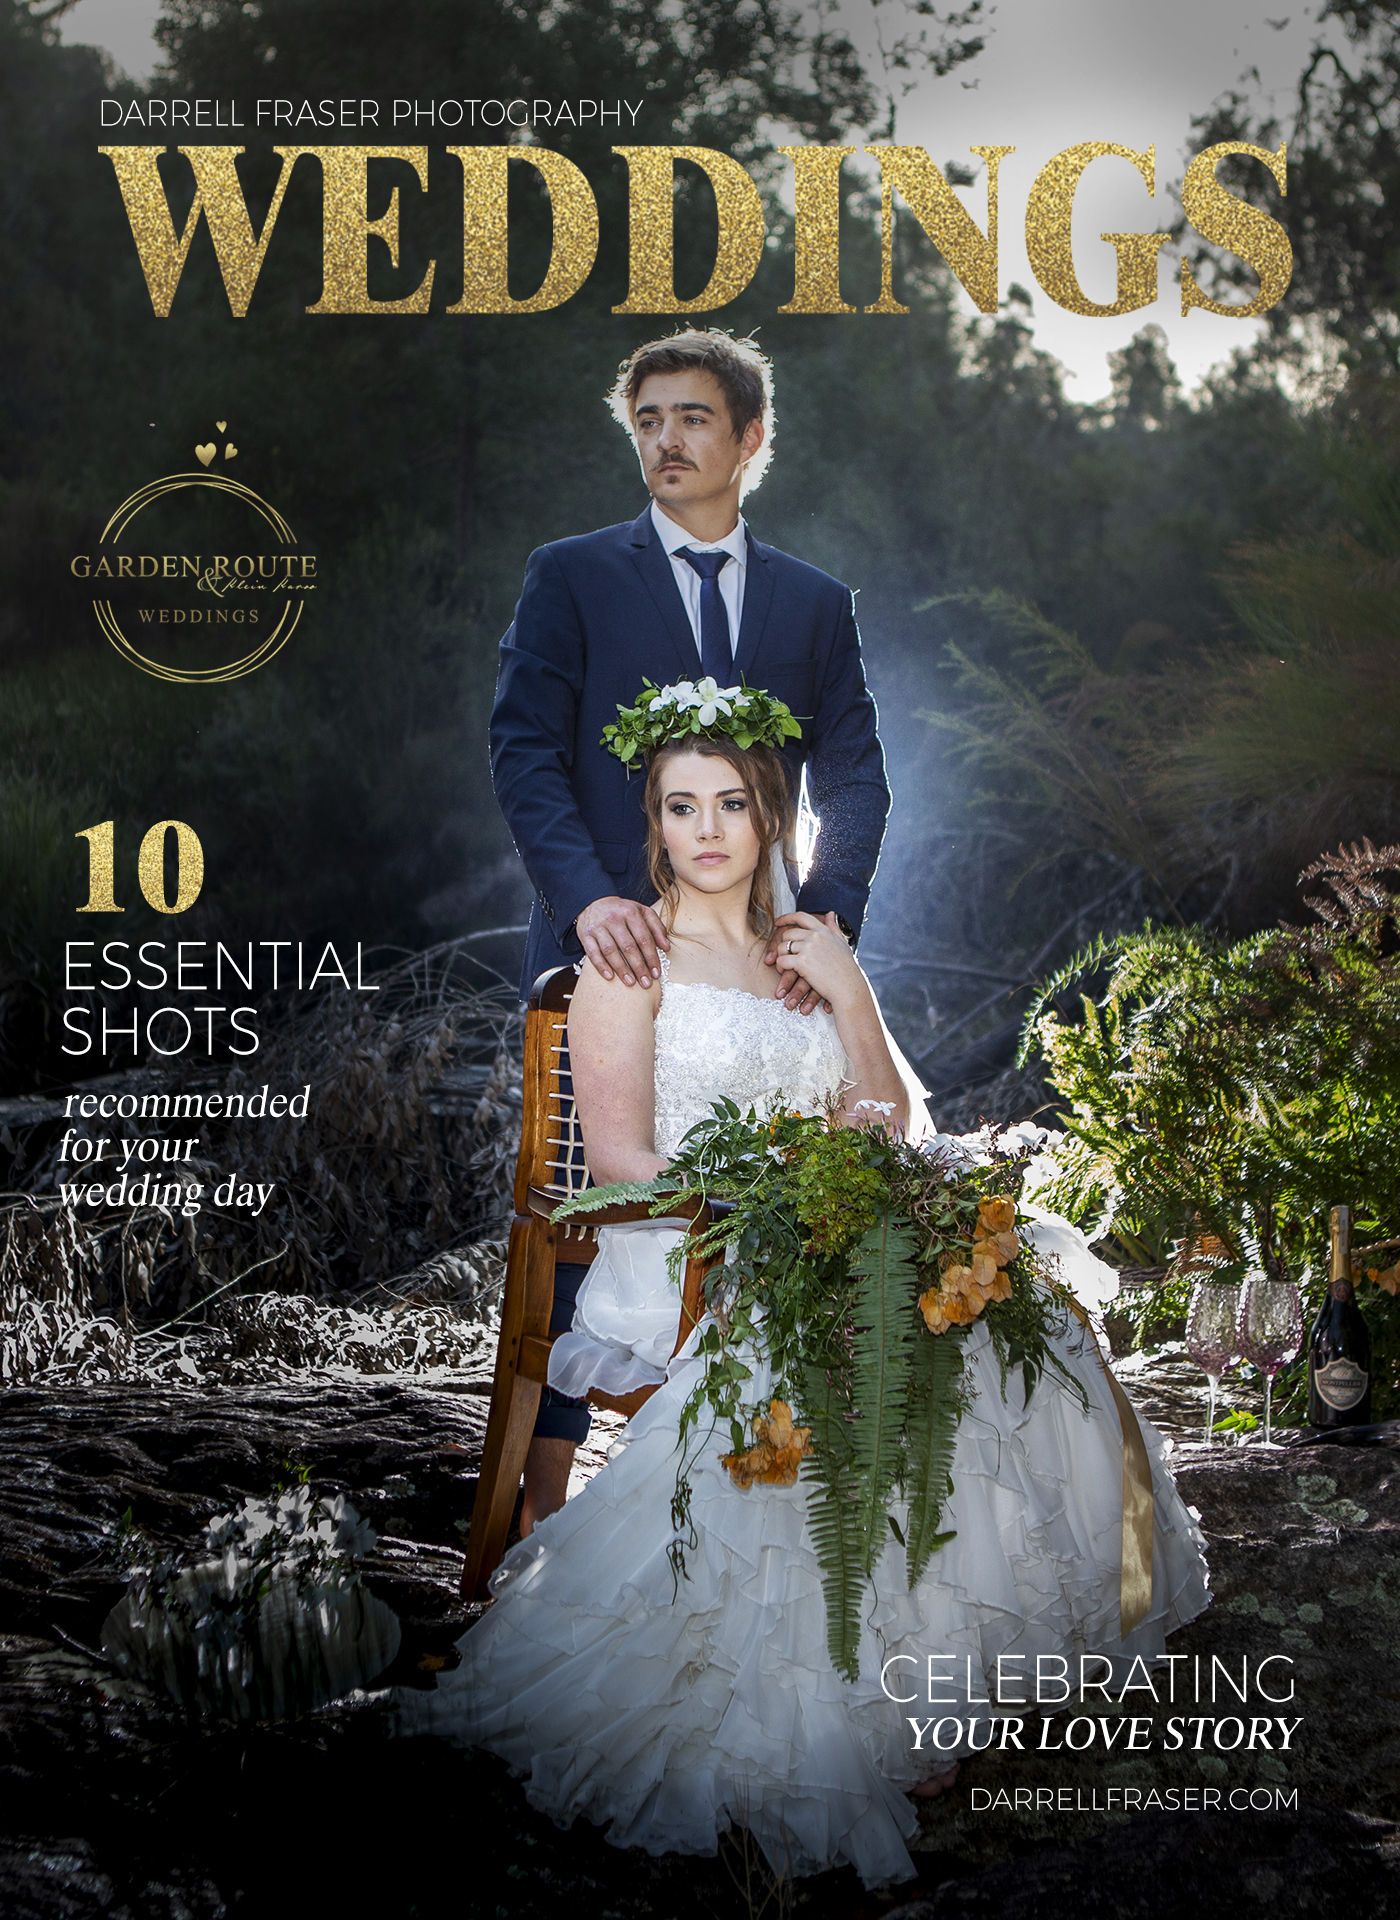 Darrell Fraser Award Winning Garden Route Wedding Photographer and Graphic Designer